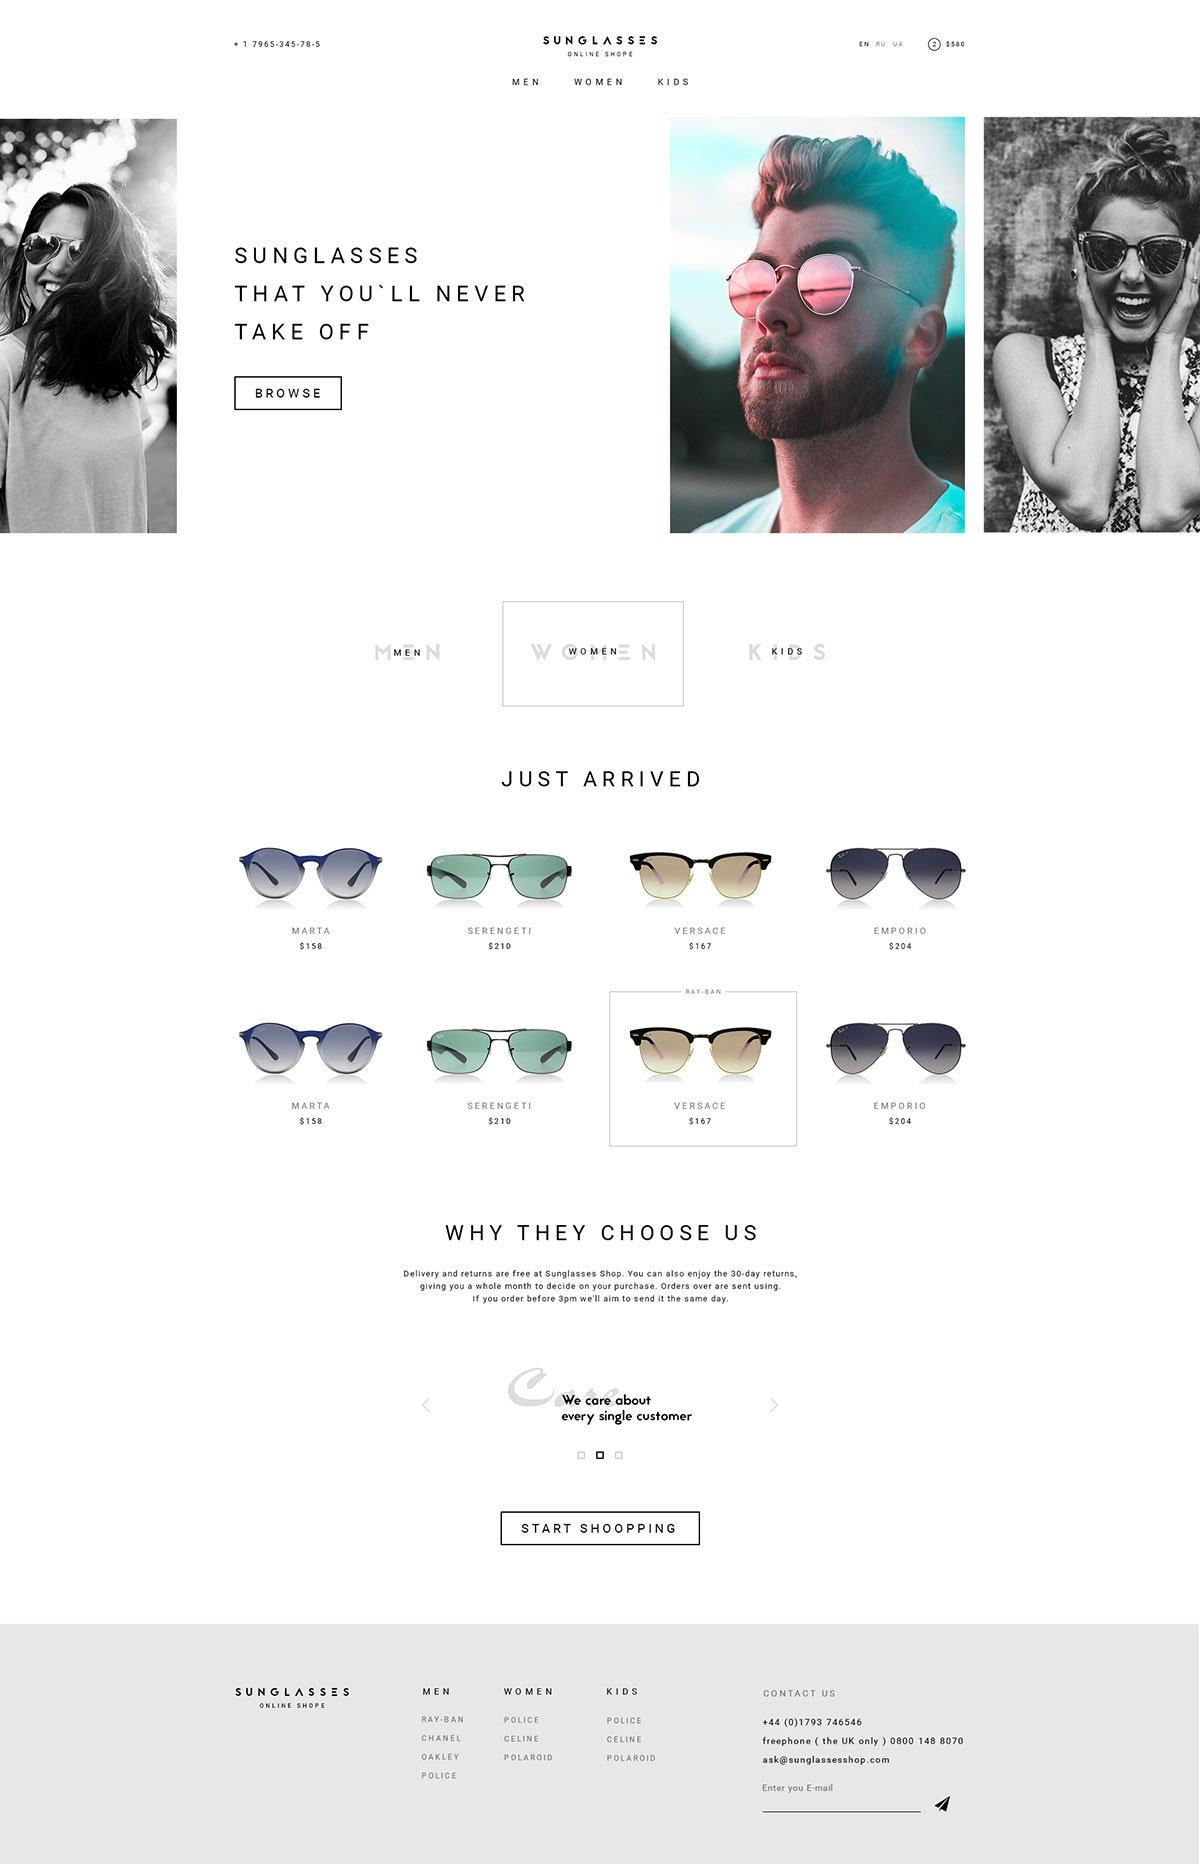 Free Sunglasses Store Online Website Design Template